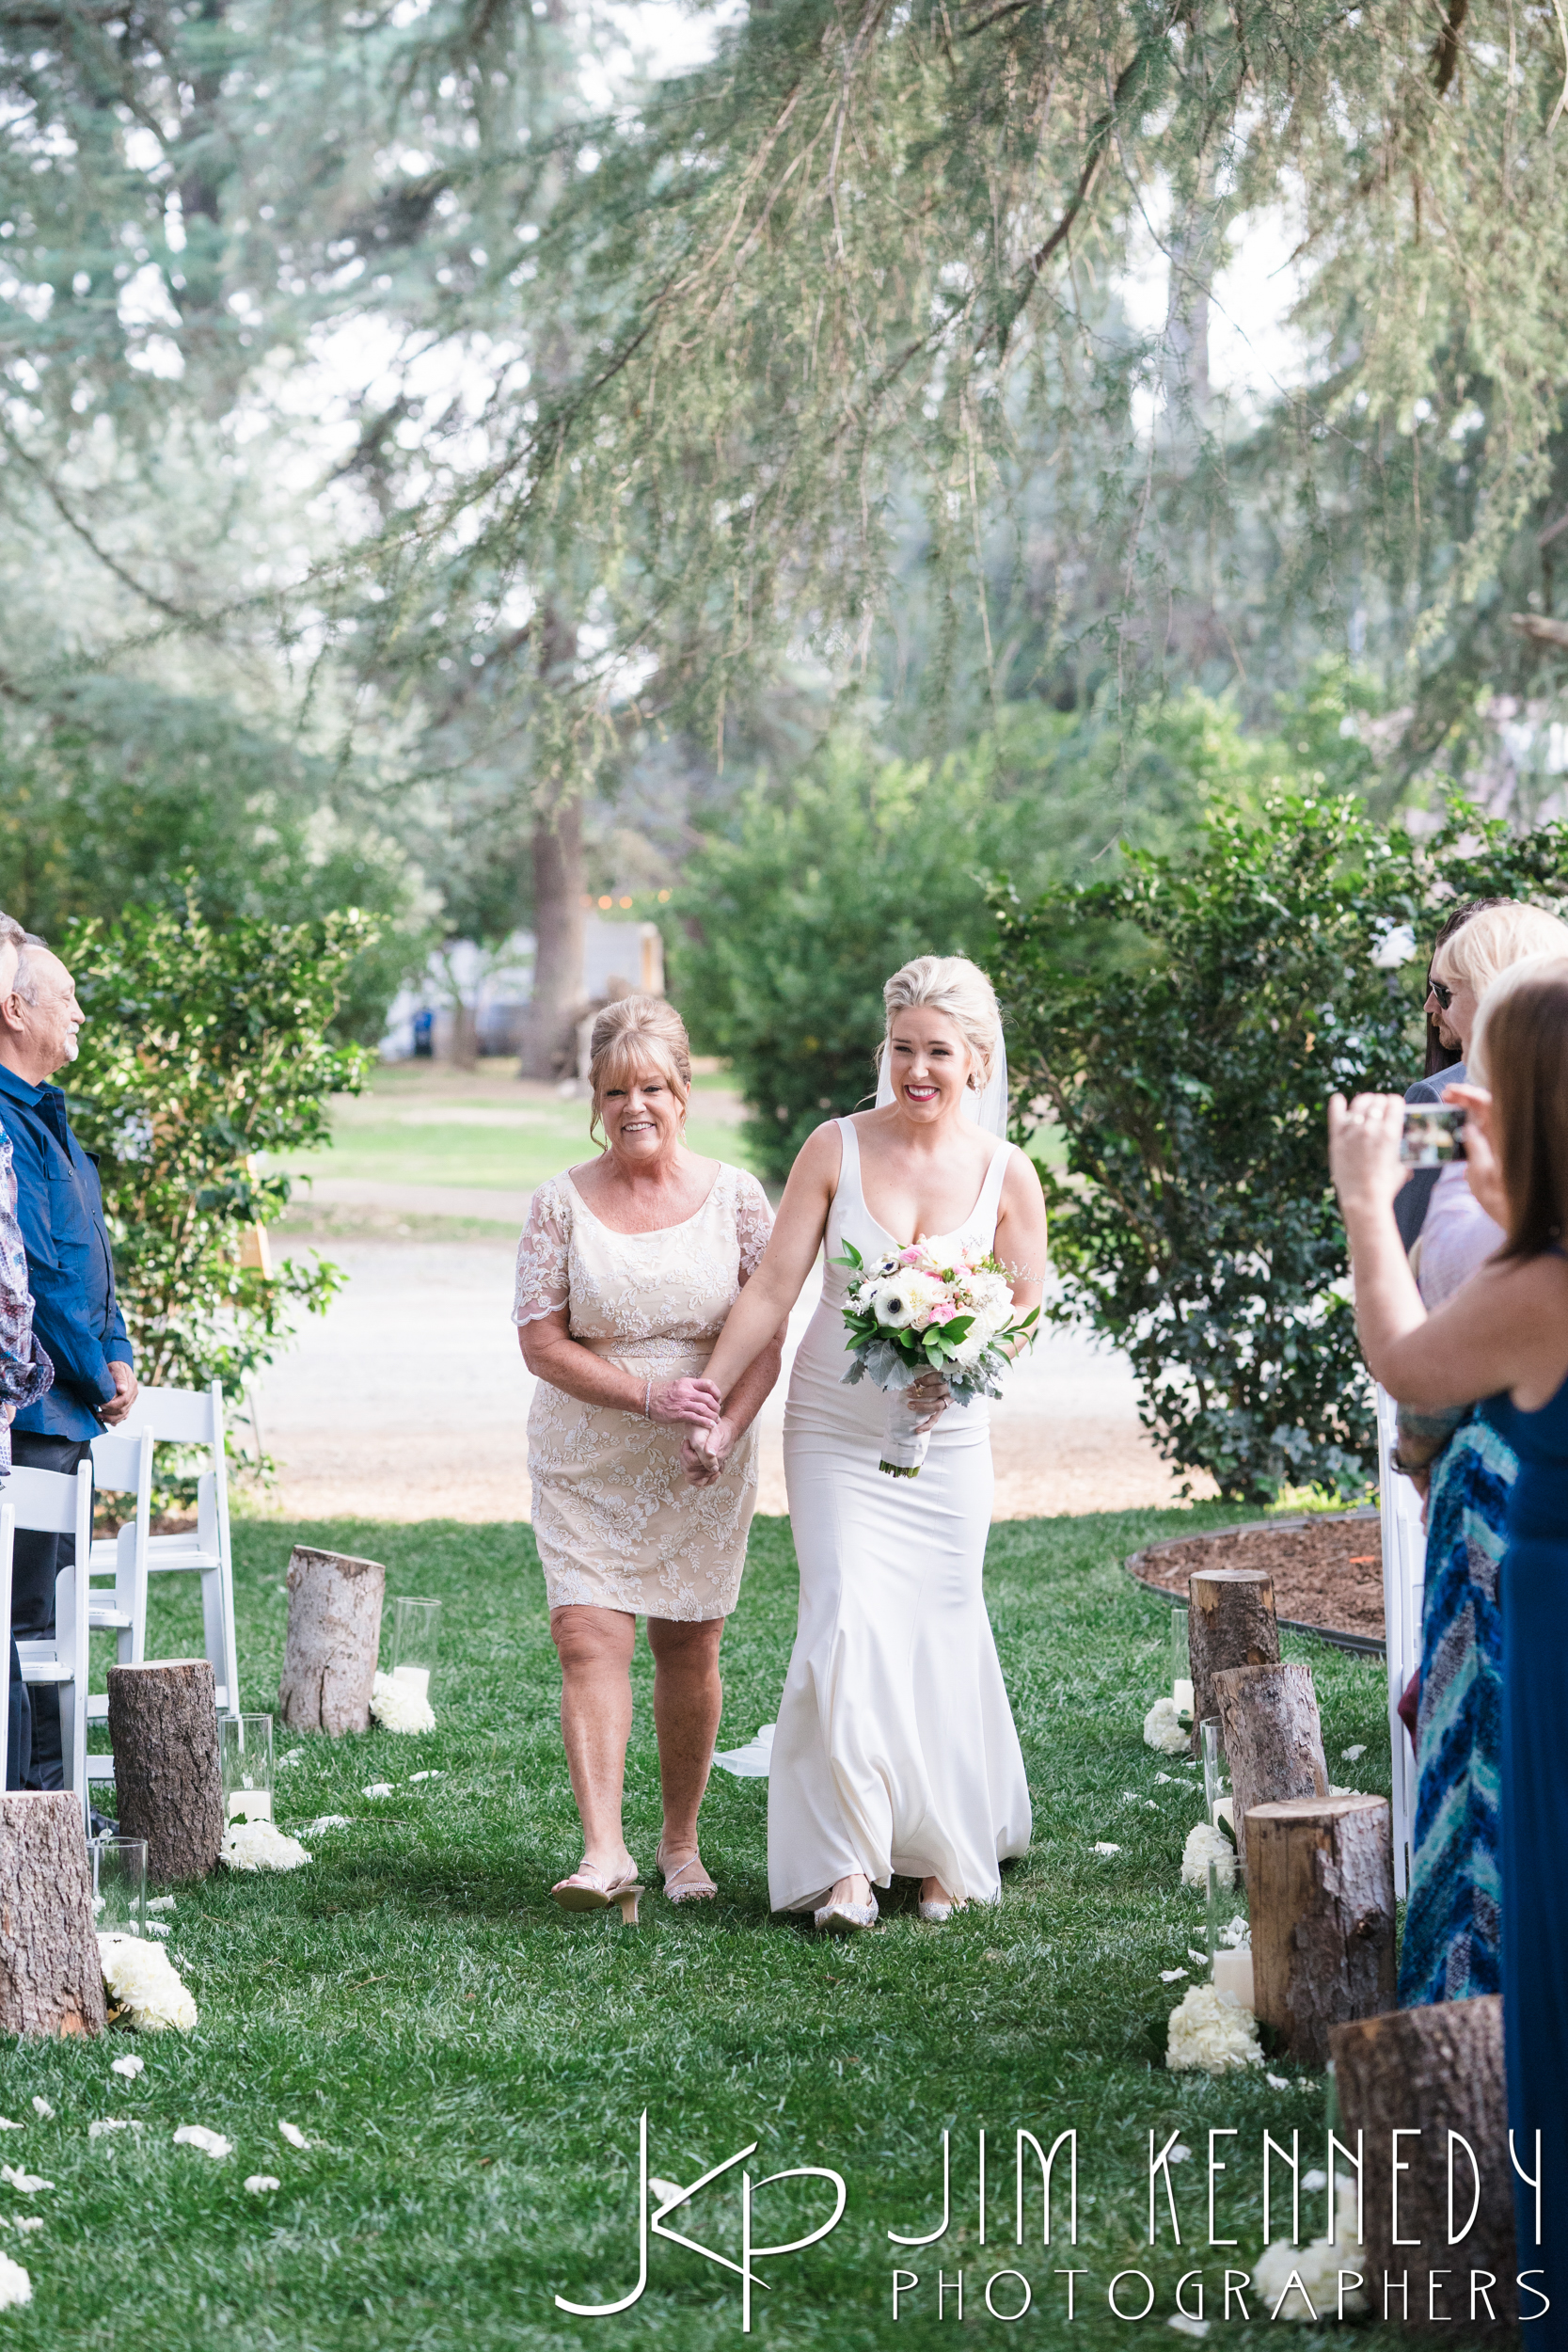 jim_kennedy_photographers_highland_springs_wedding_caitlyn_0101.jpg